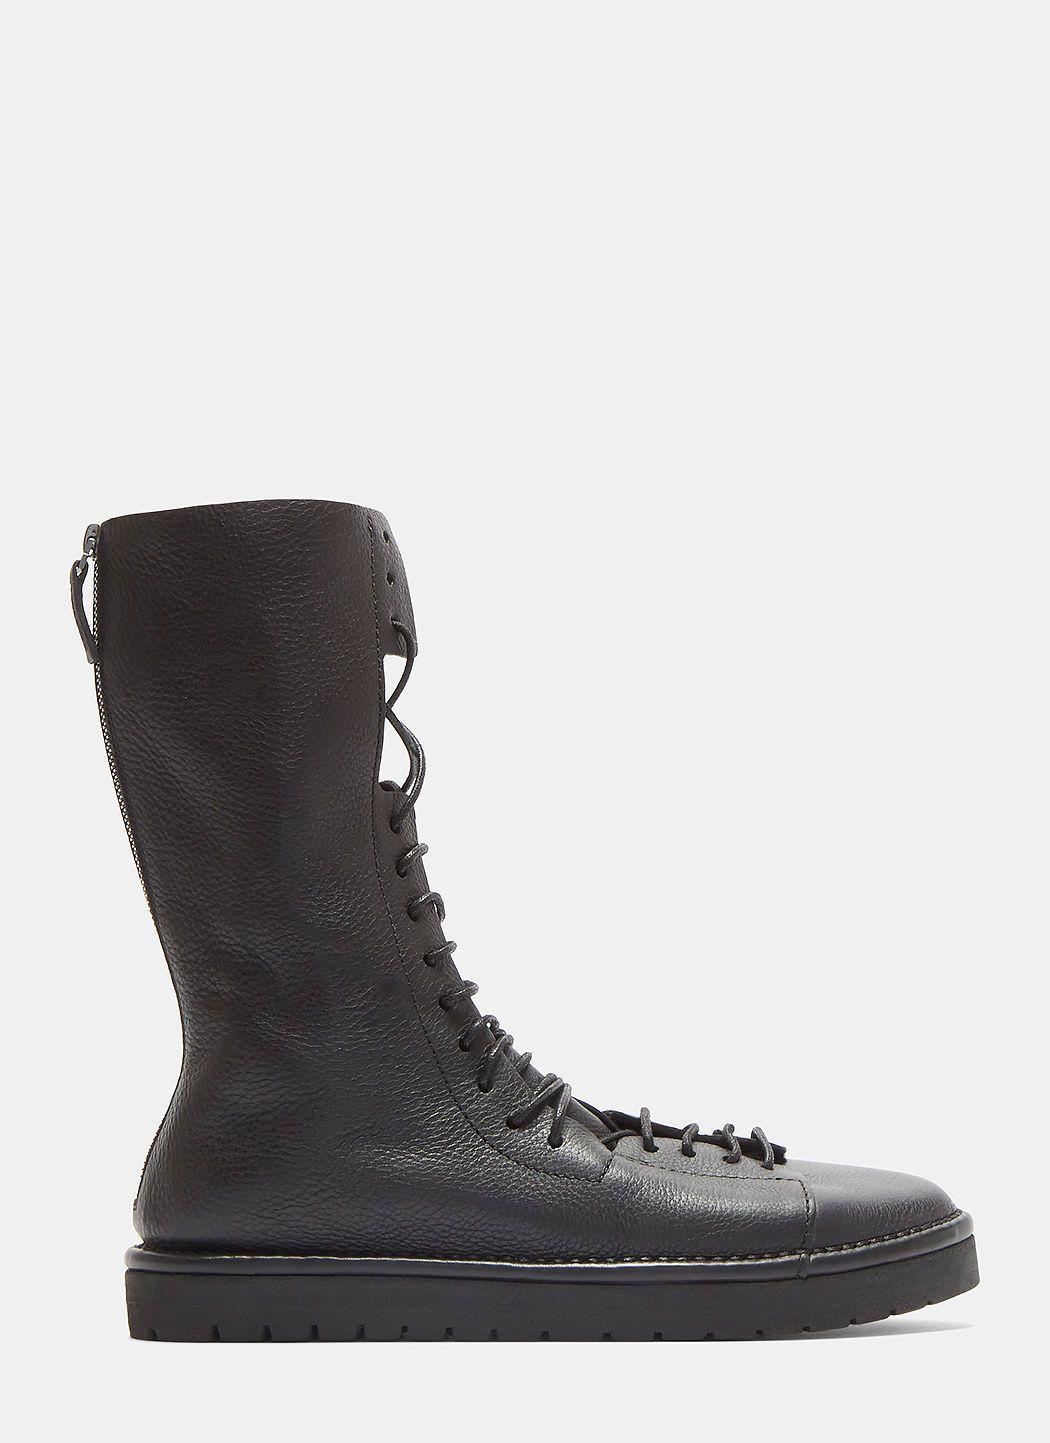 Sancrispa Alta boots - Black Mars Cheap Sale Reliable Outlet Recommend Websites Cheap Online Clearance Best Seller Outlet Purchase 8xpXHr88